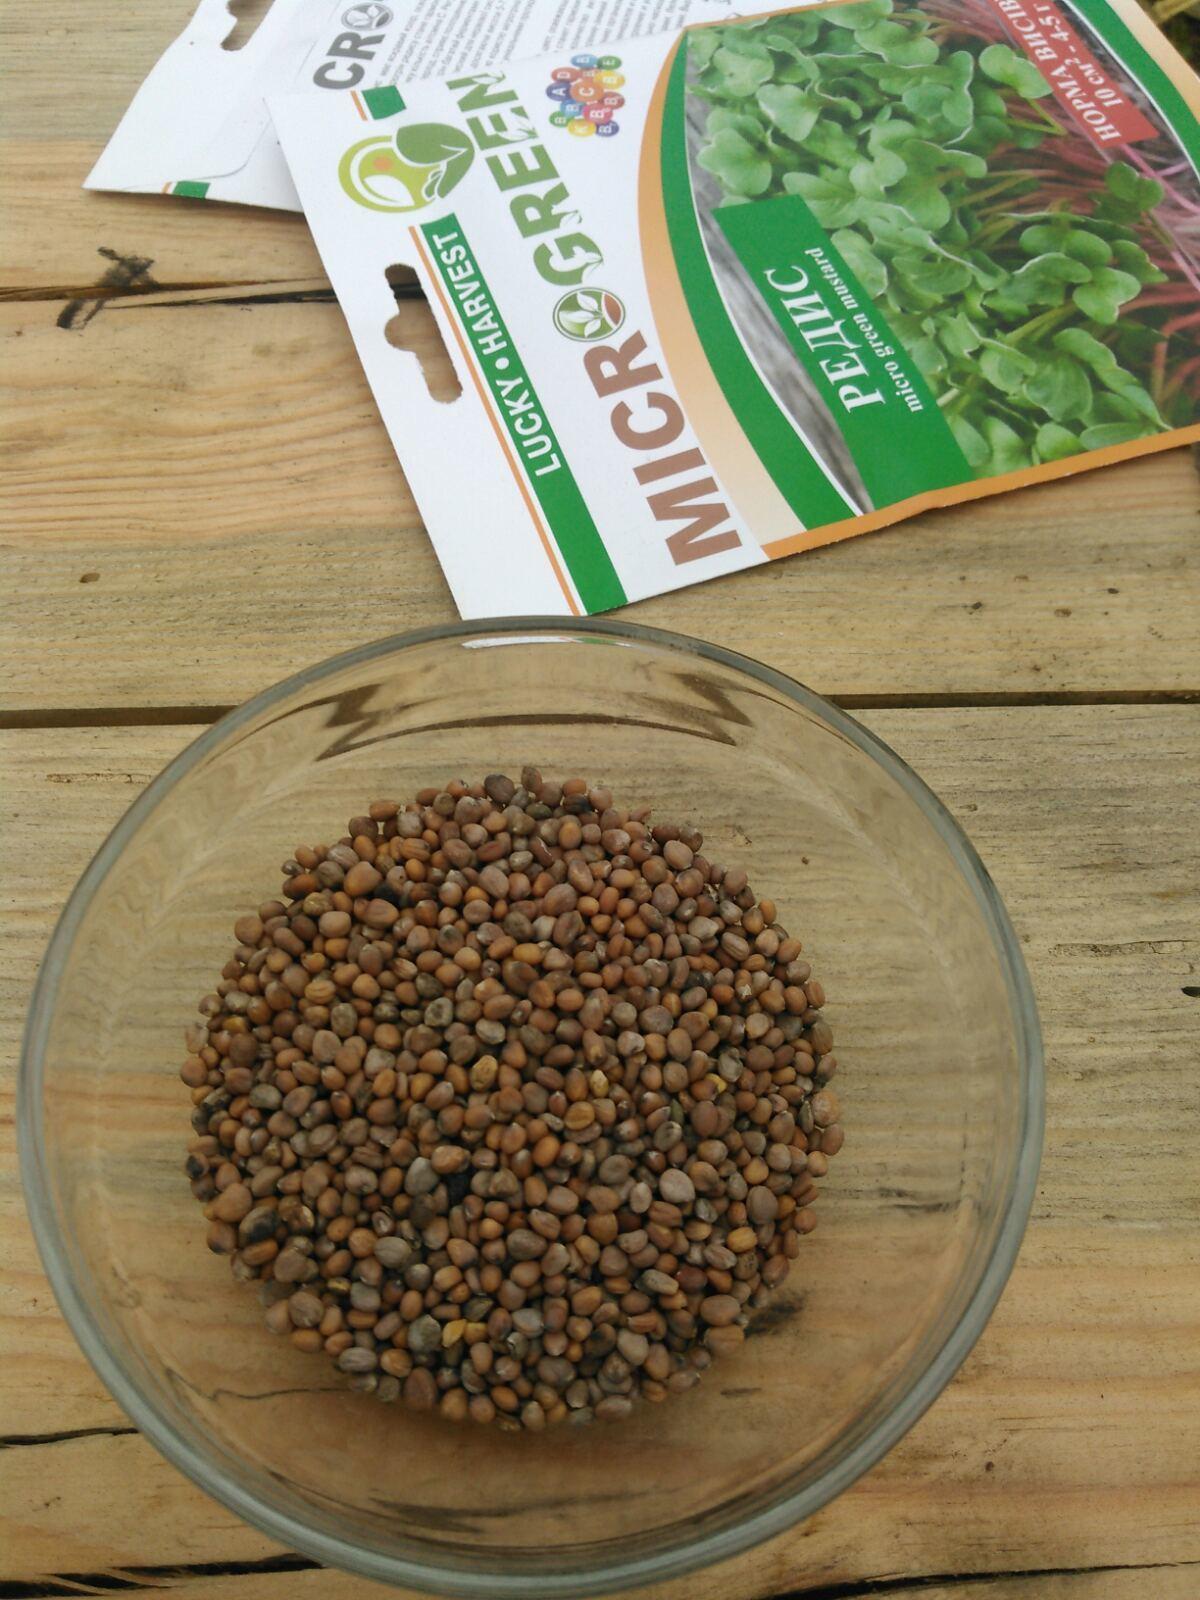 MICROGREEN  SET  РЕДИС  для выращивания микрозелени   ТМ LUCKY HARVEST